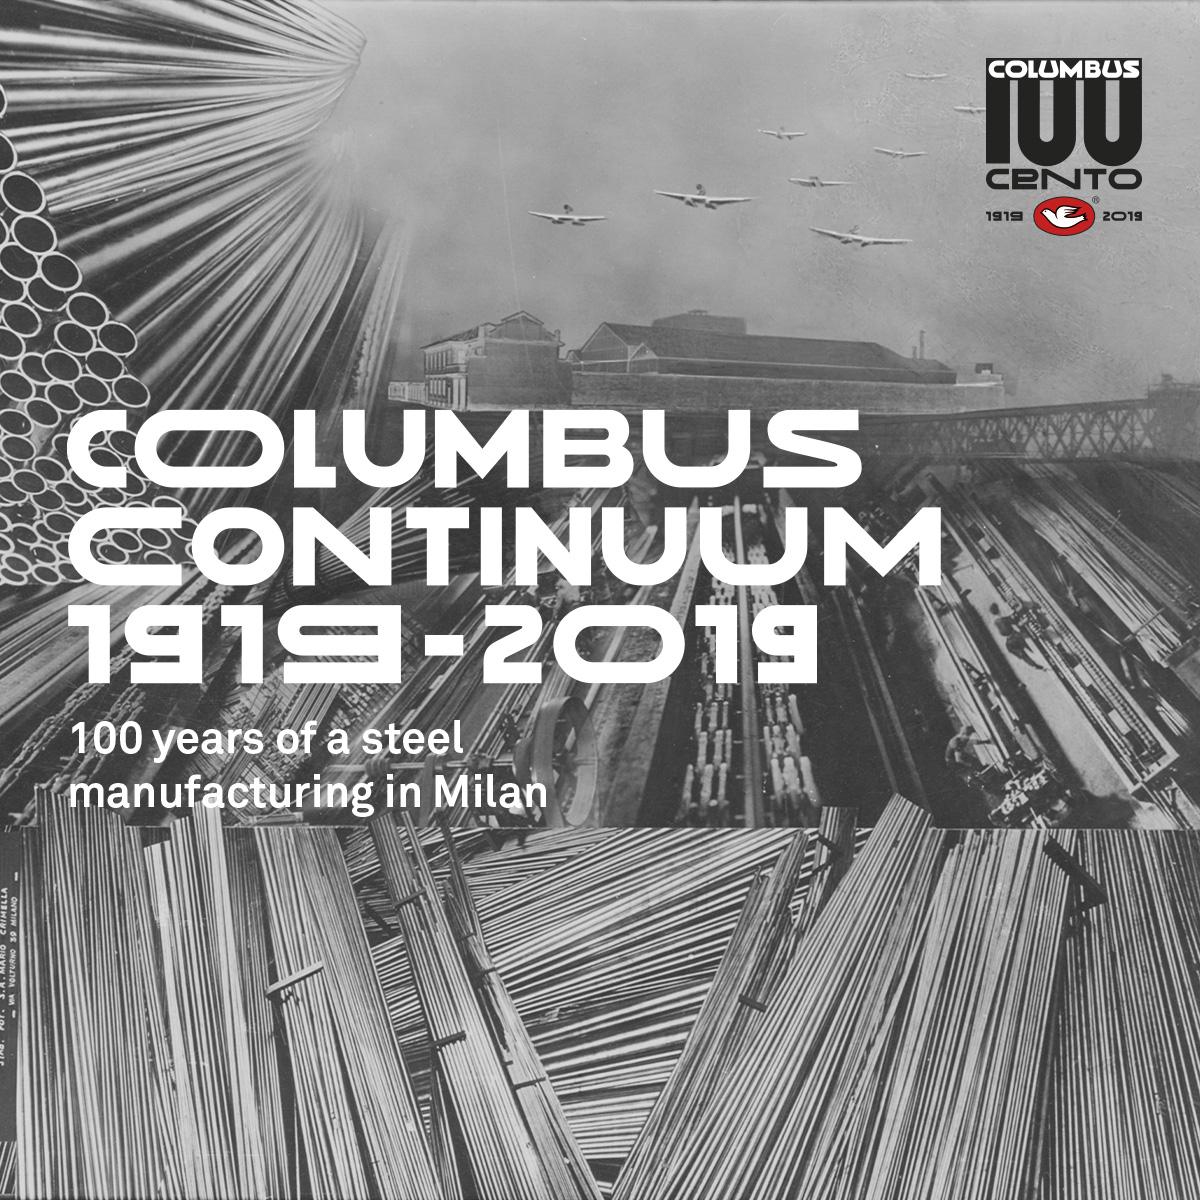 Columbus Continuum 100 Years Celebrations